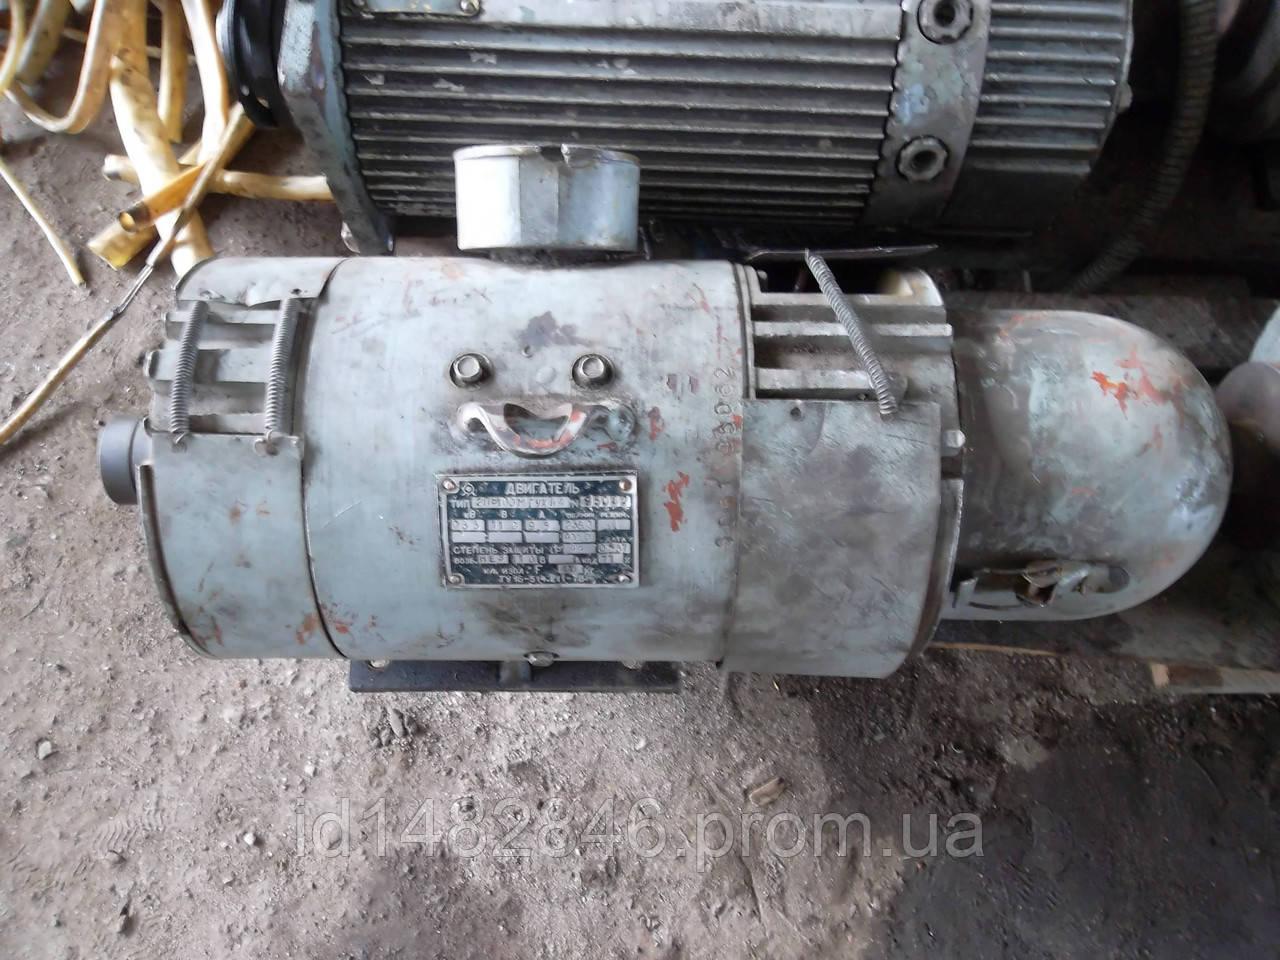 Электродвигатель ПТ 2ПБ100МГ